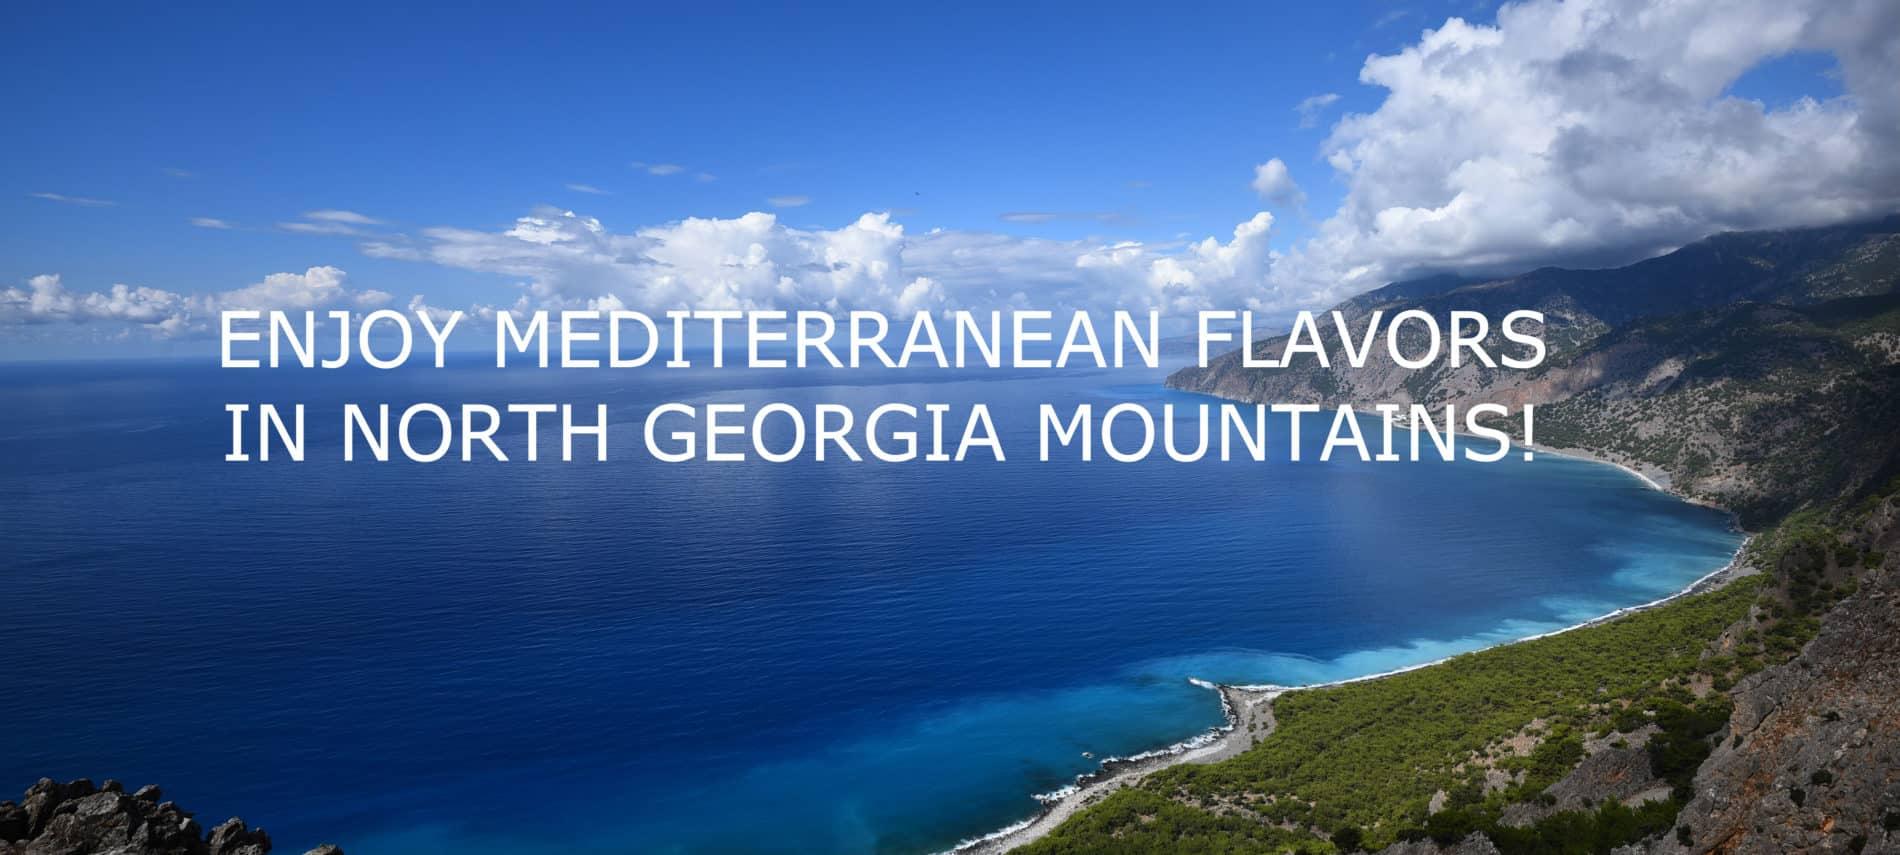 Vibrant blue Mediterranean sea coastline. with a title: Enjoy mediterranean flavors in north georgia mountains!